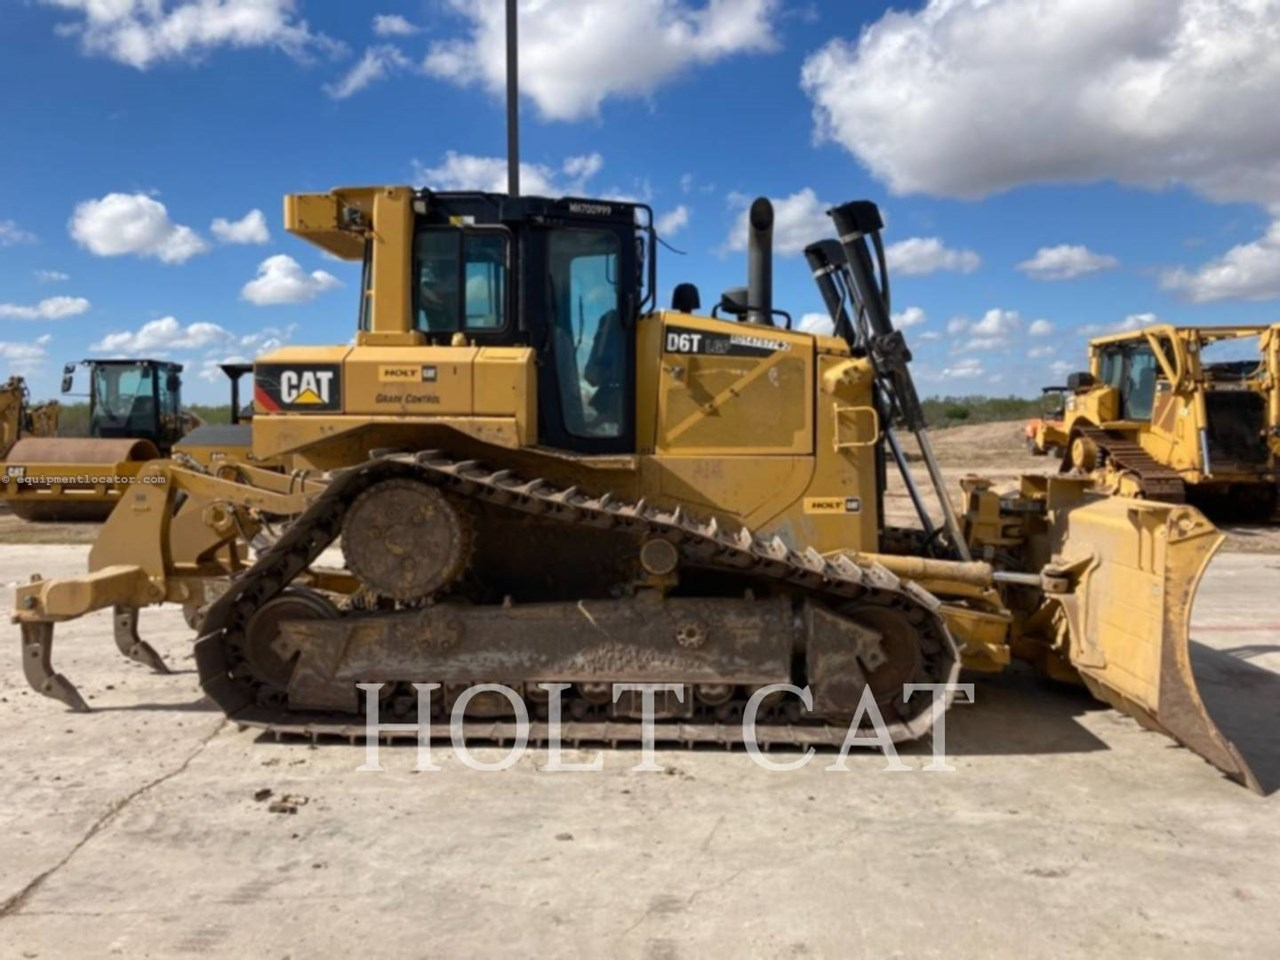 2019 Caterpillar D6T LGPVP Image 1